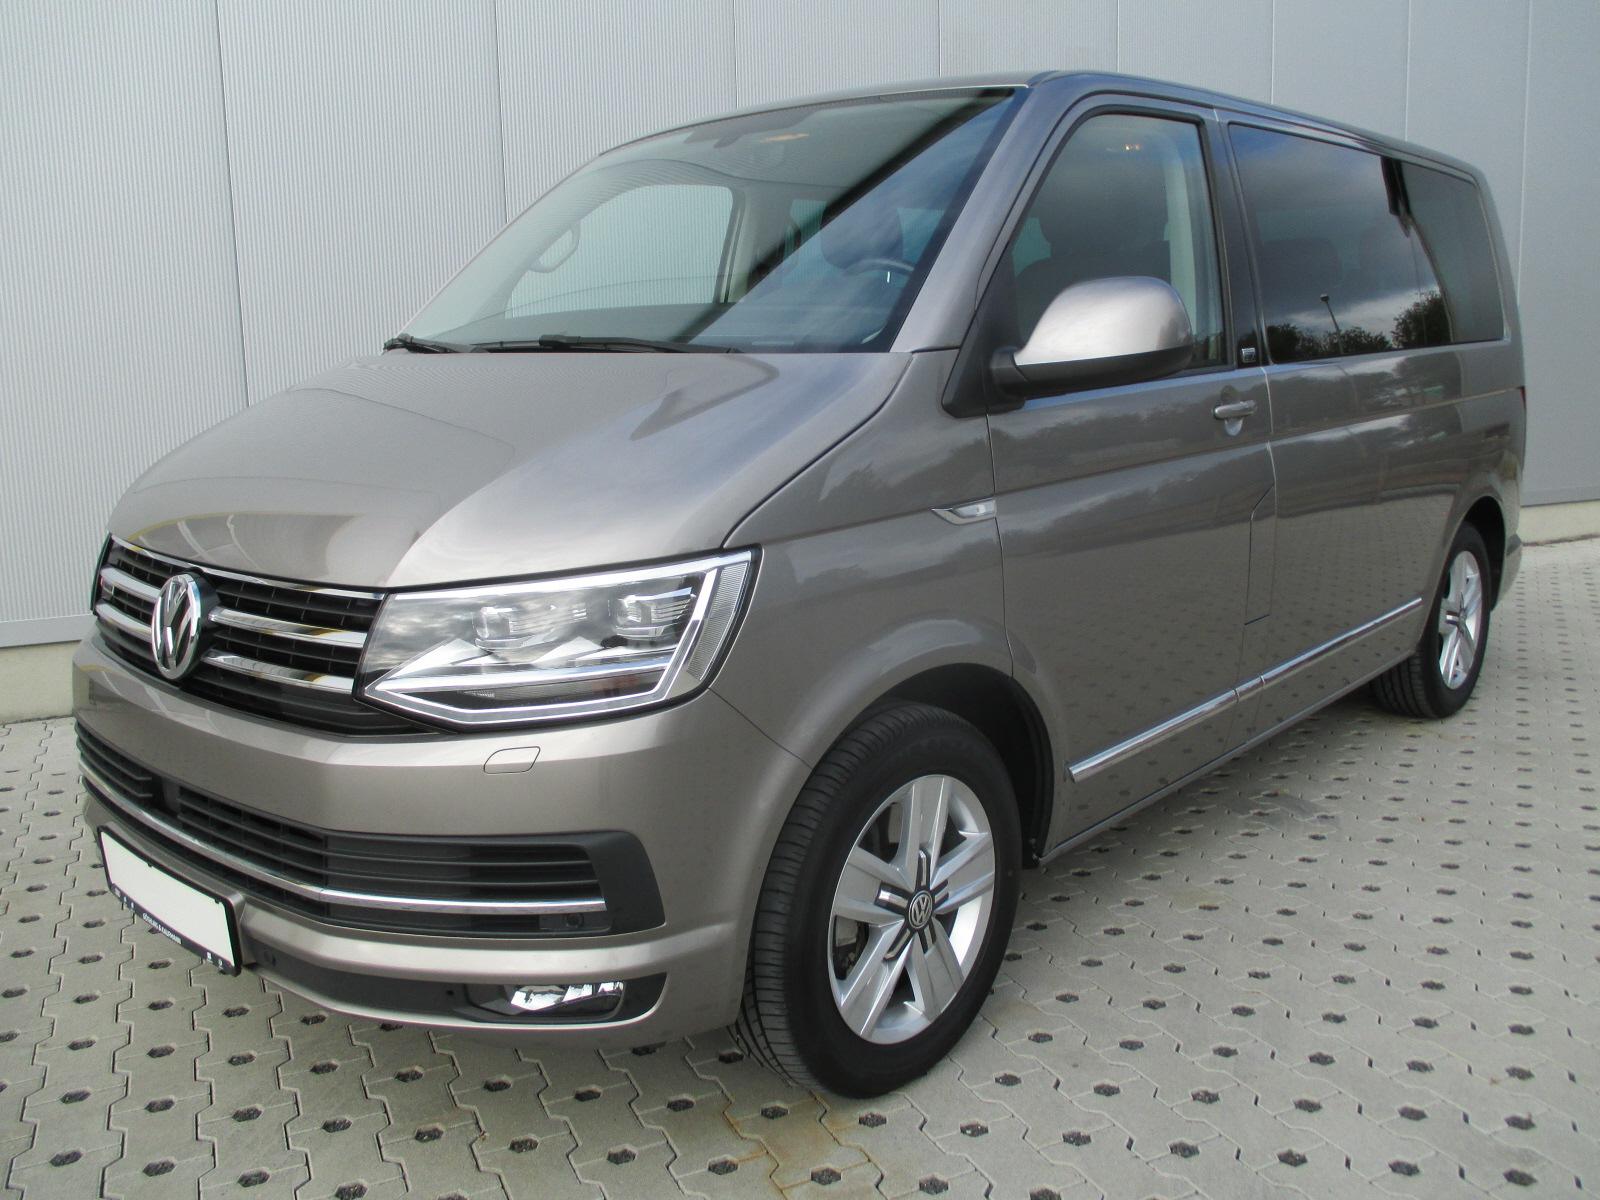 Volkswagen Multivan 2.0 TDI*4Mo*Genera6*LED*Standh*AHK*Alca, Jahr 2017, Diesel